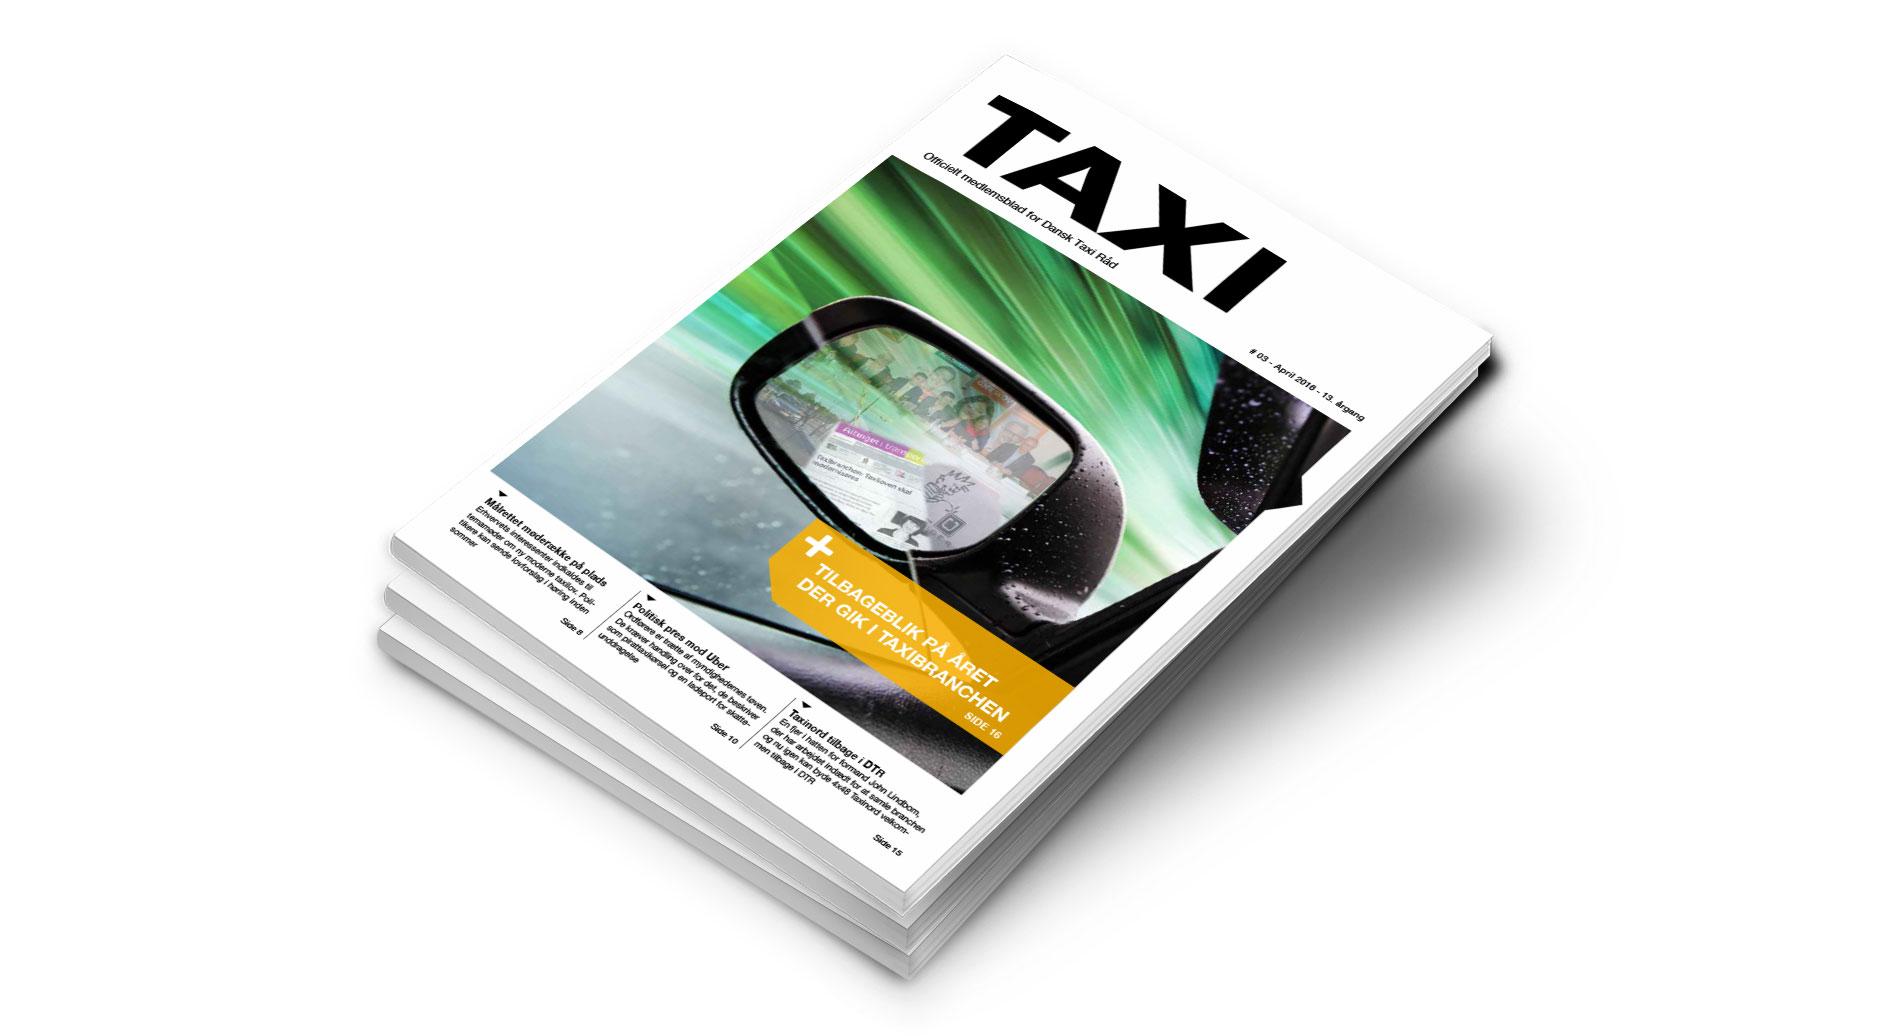 http://horisontgruppen.dk/wp-content/uploads/2016/05/taxi_magasin.jpg